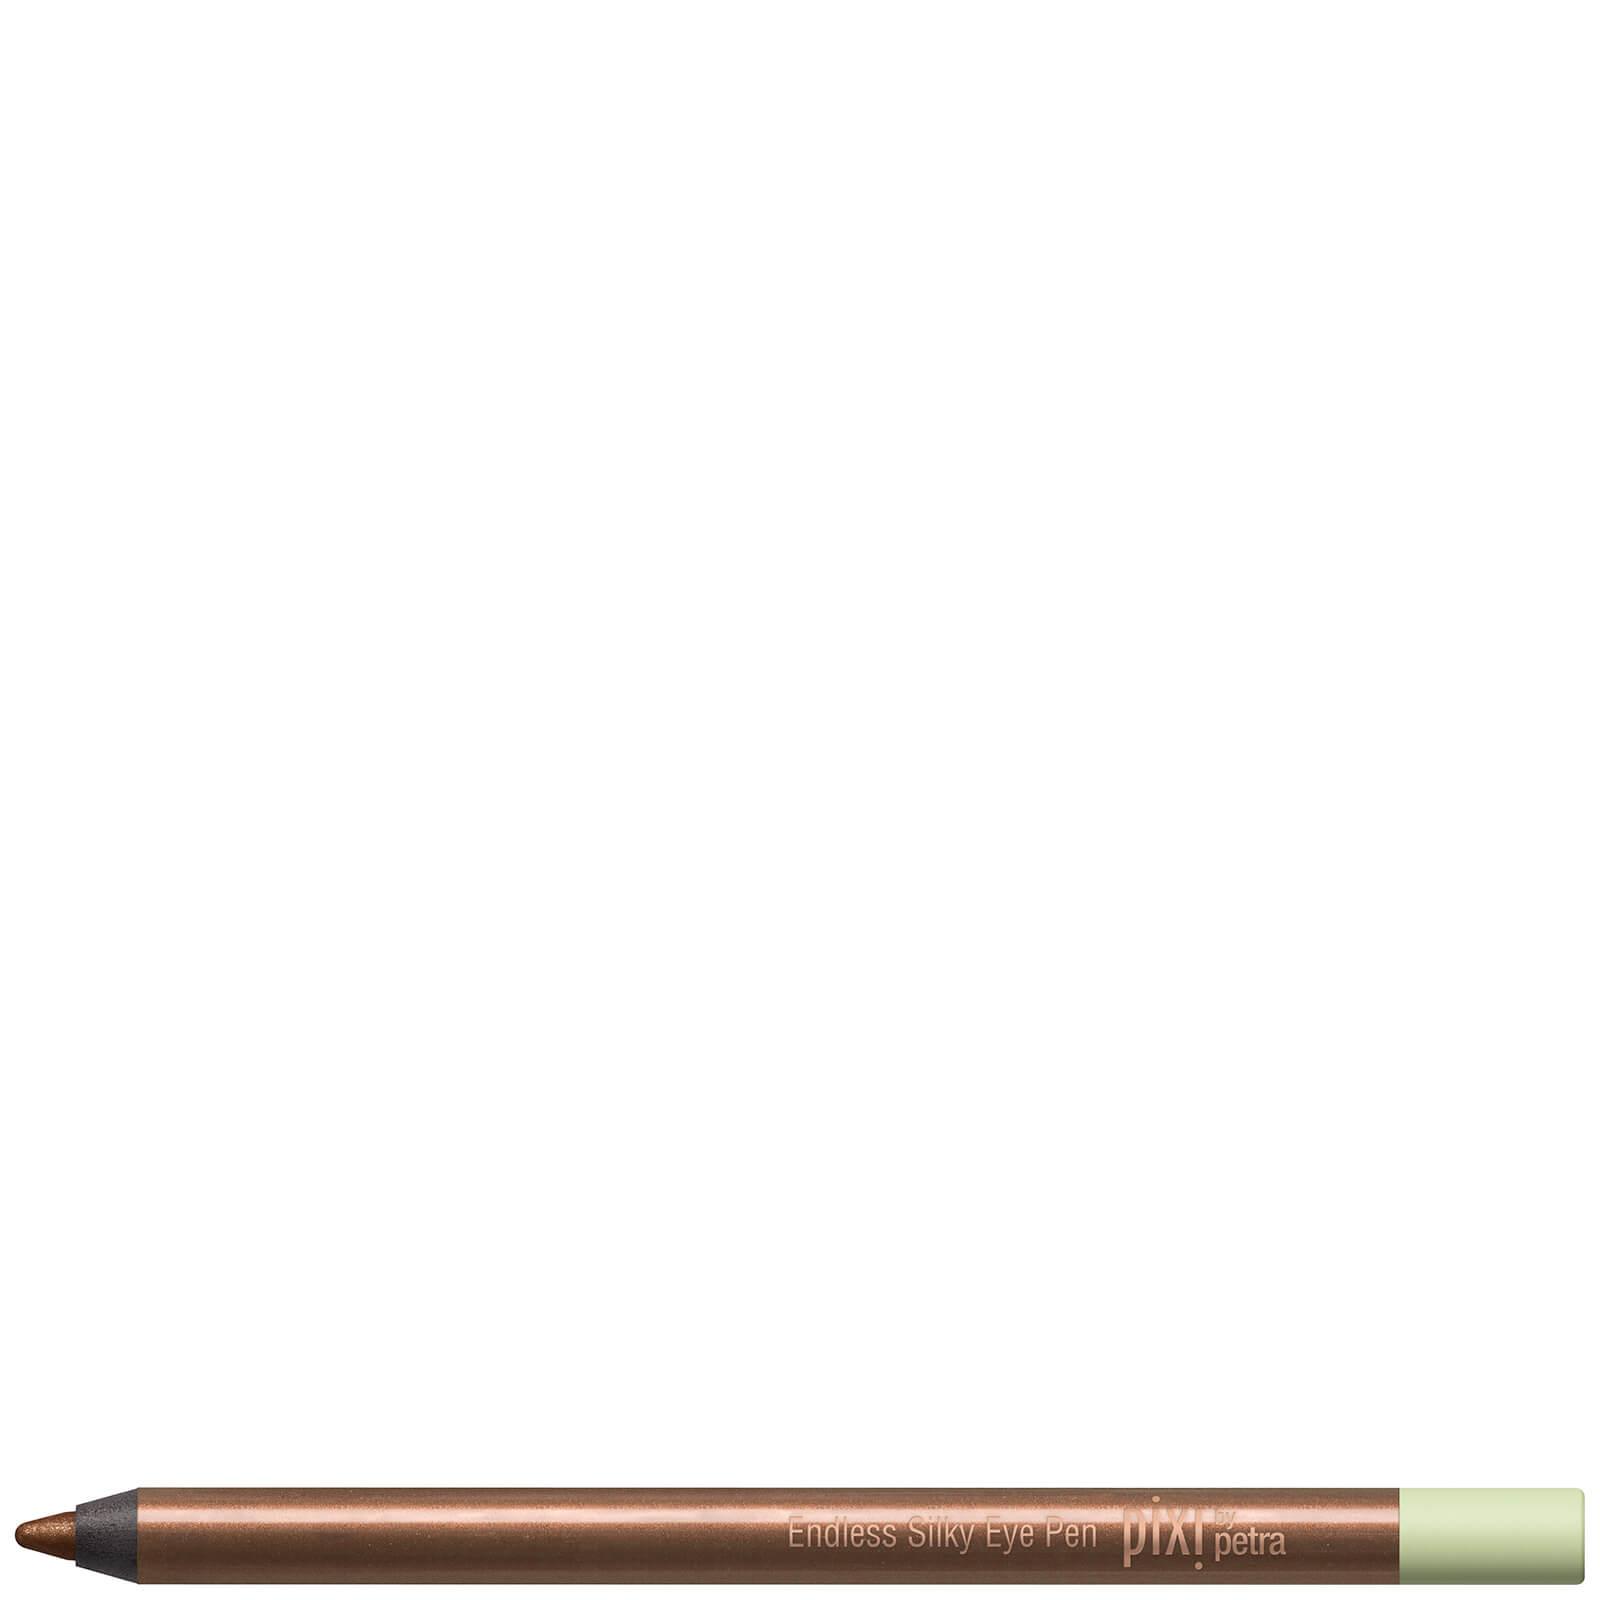 Pixi Endless Silky Eye Crayon pourles yeux - BronzeBeam